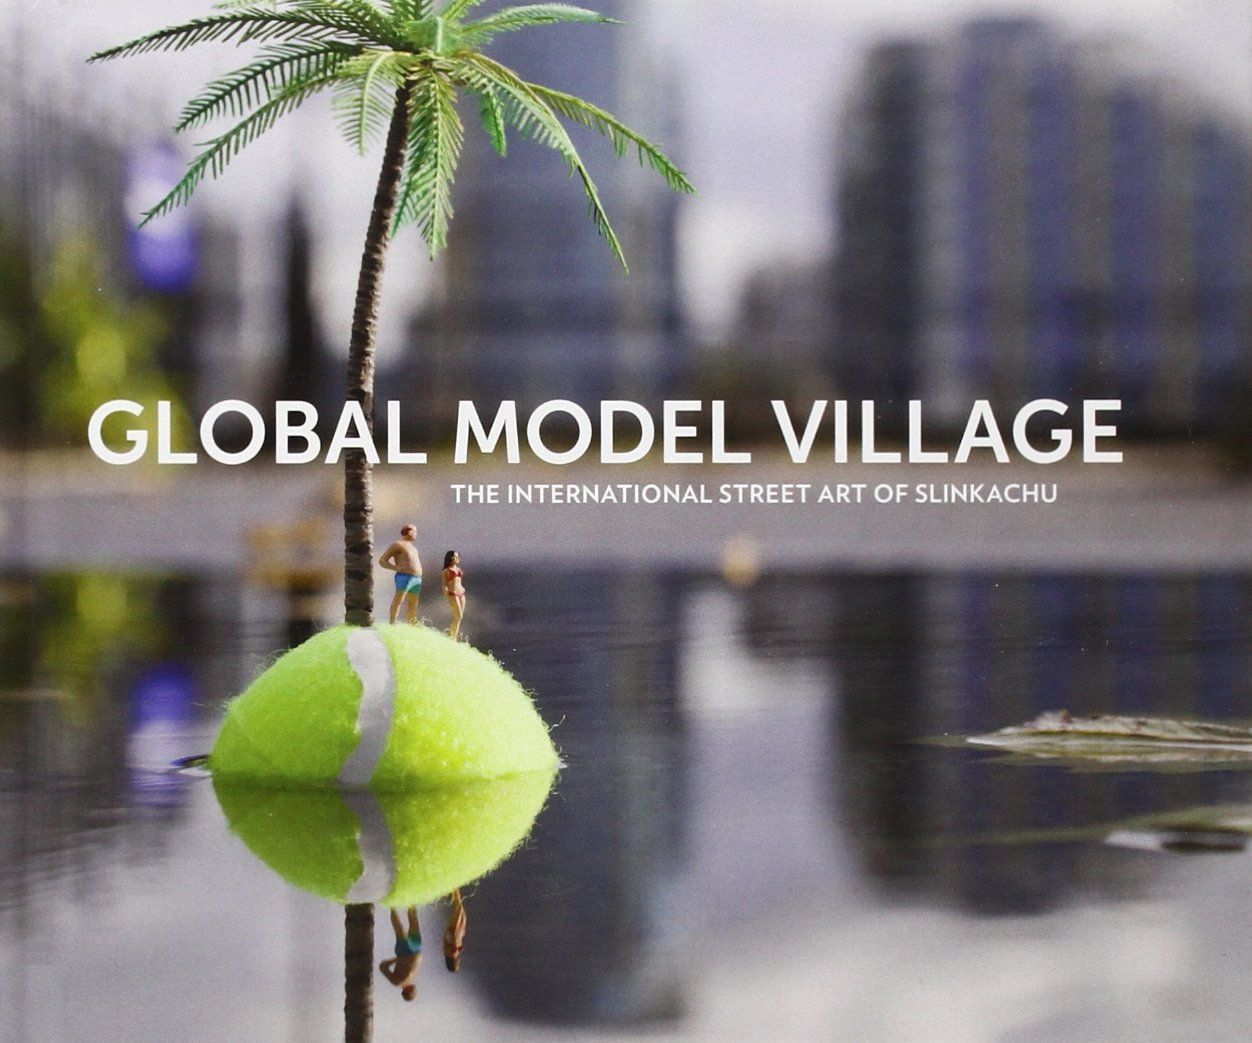 Global Model Village: The International Street Art of Slinkachu: Slinkachu